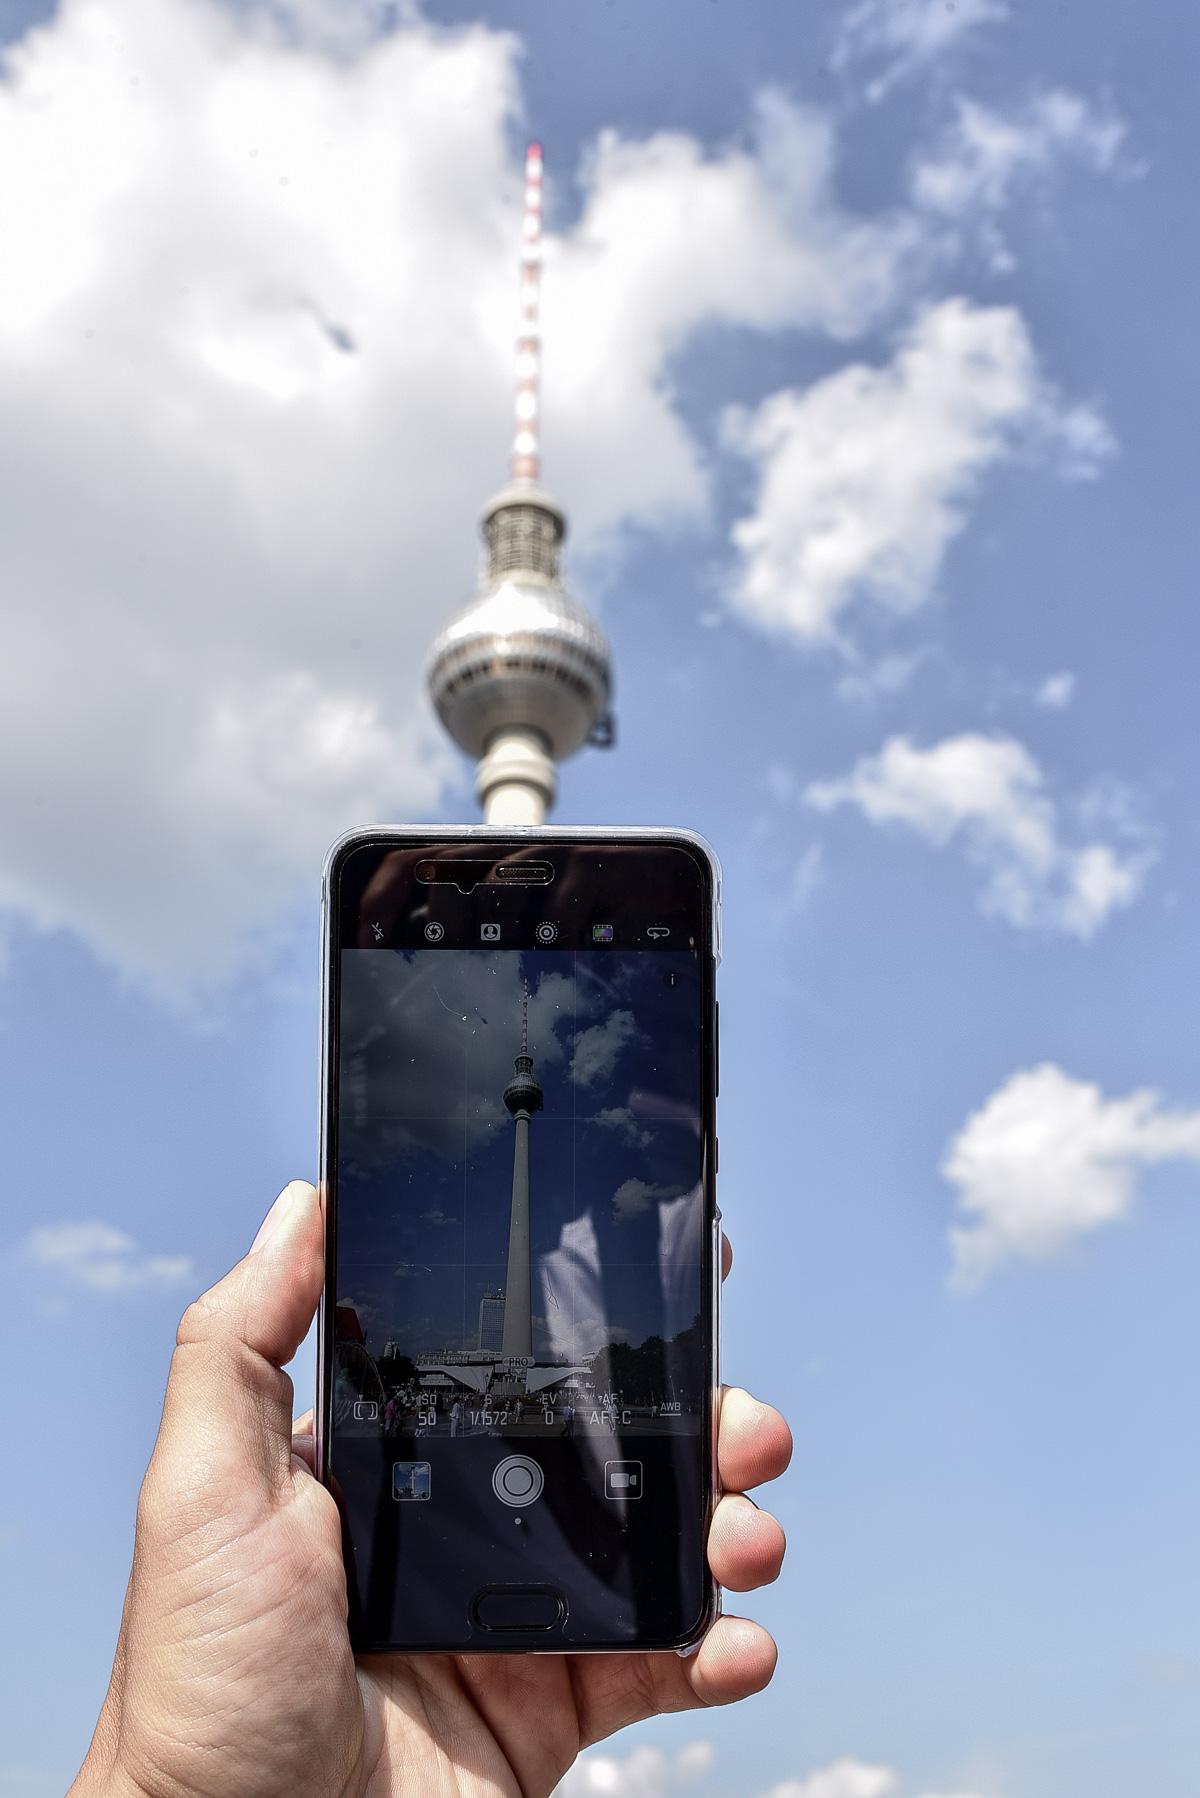 Tommeezjerry-Maennermodeblog-Maennermode-Fashionblog-Styleblog-Berlinblog--Lifestyleblog-Huawei-P10-Plus-Leica-Kamera-Samrtphone-Berlin-Casualchic-Outift-Gucci